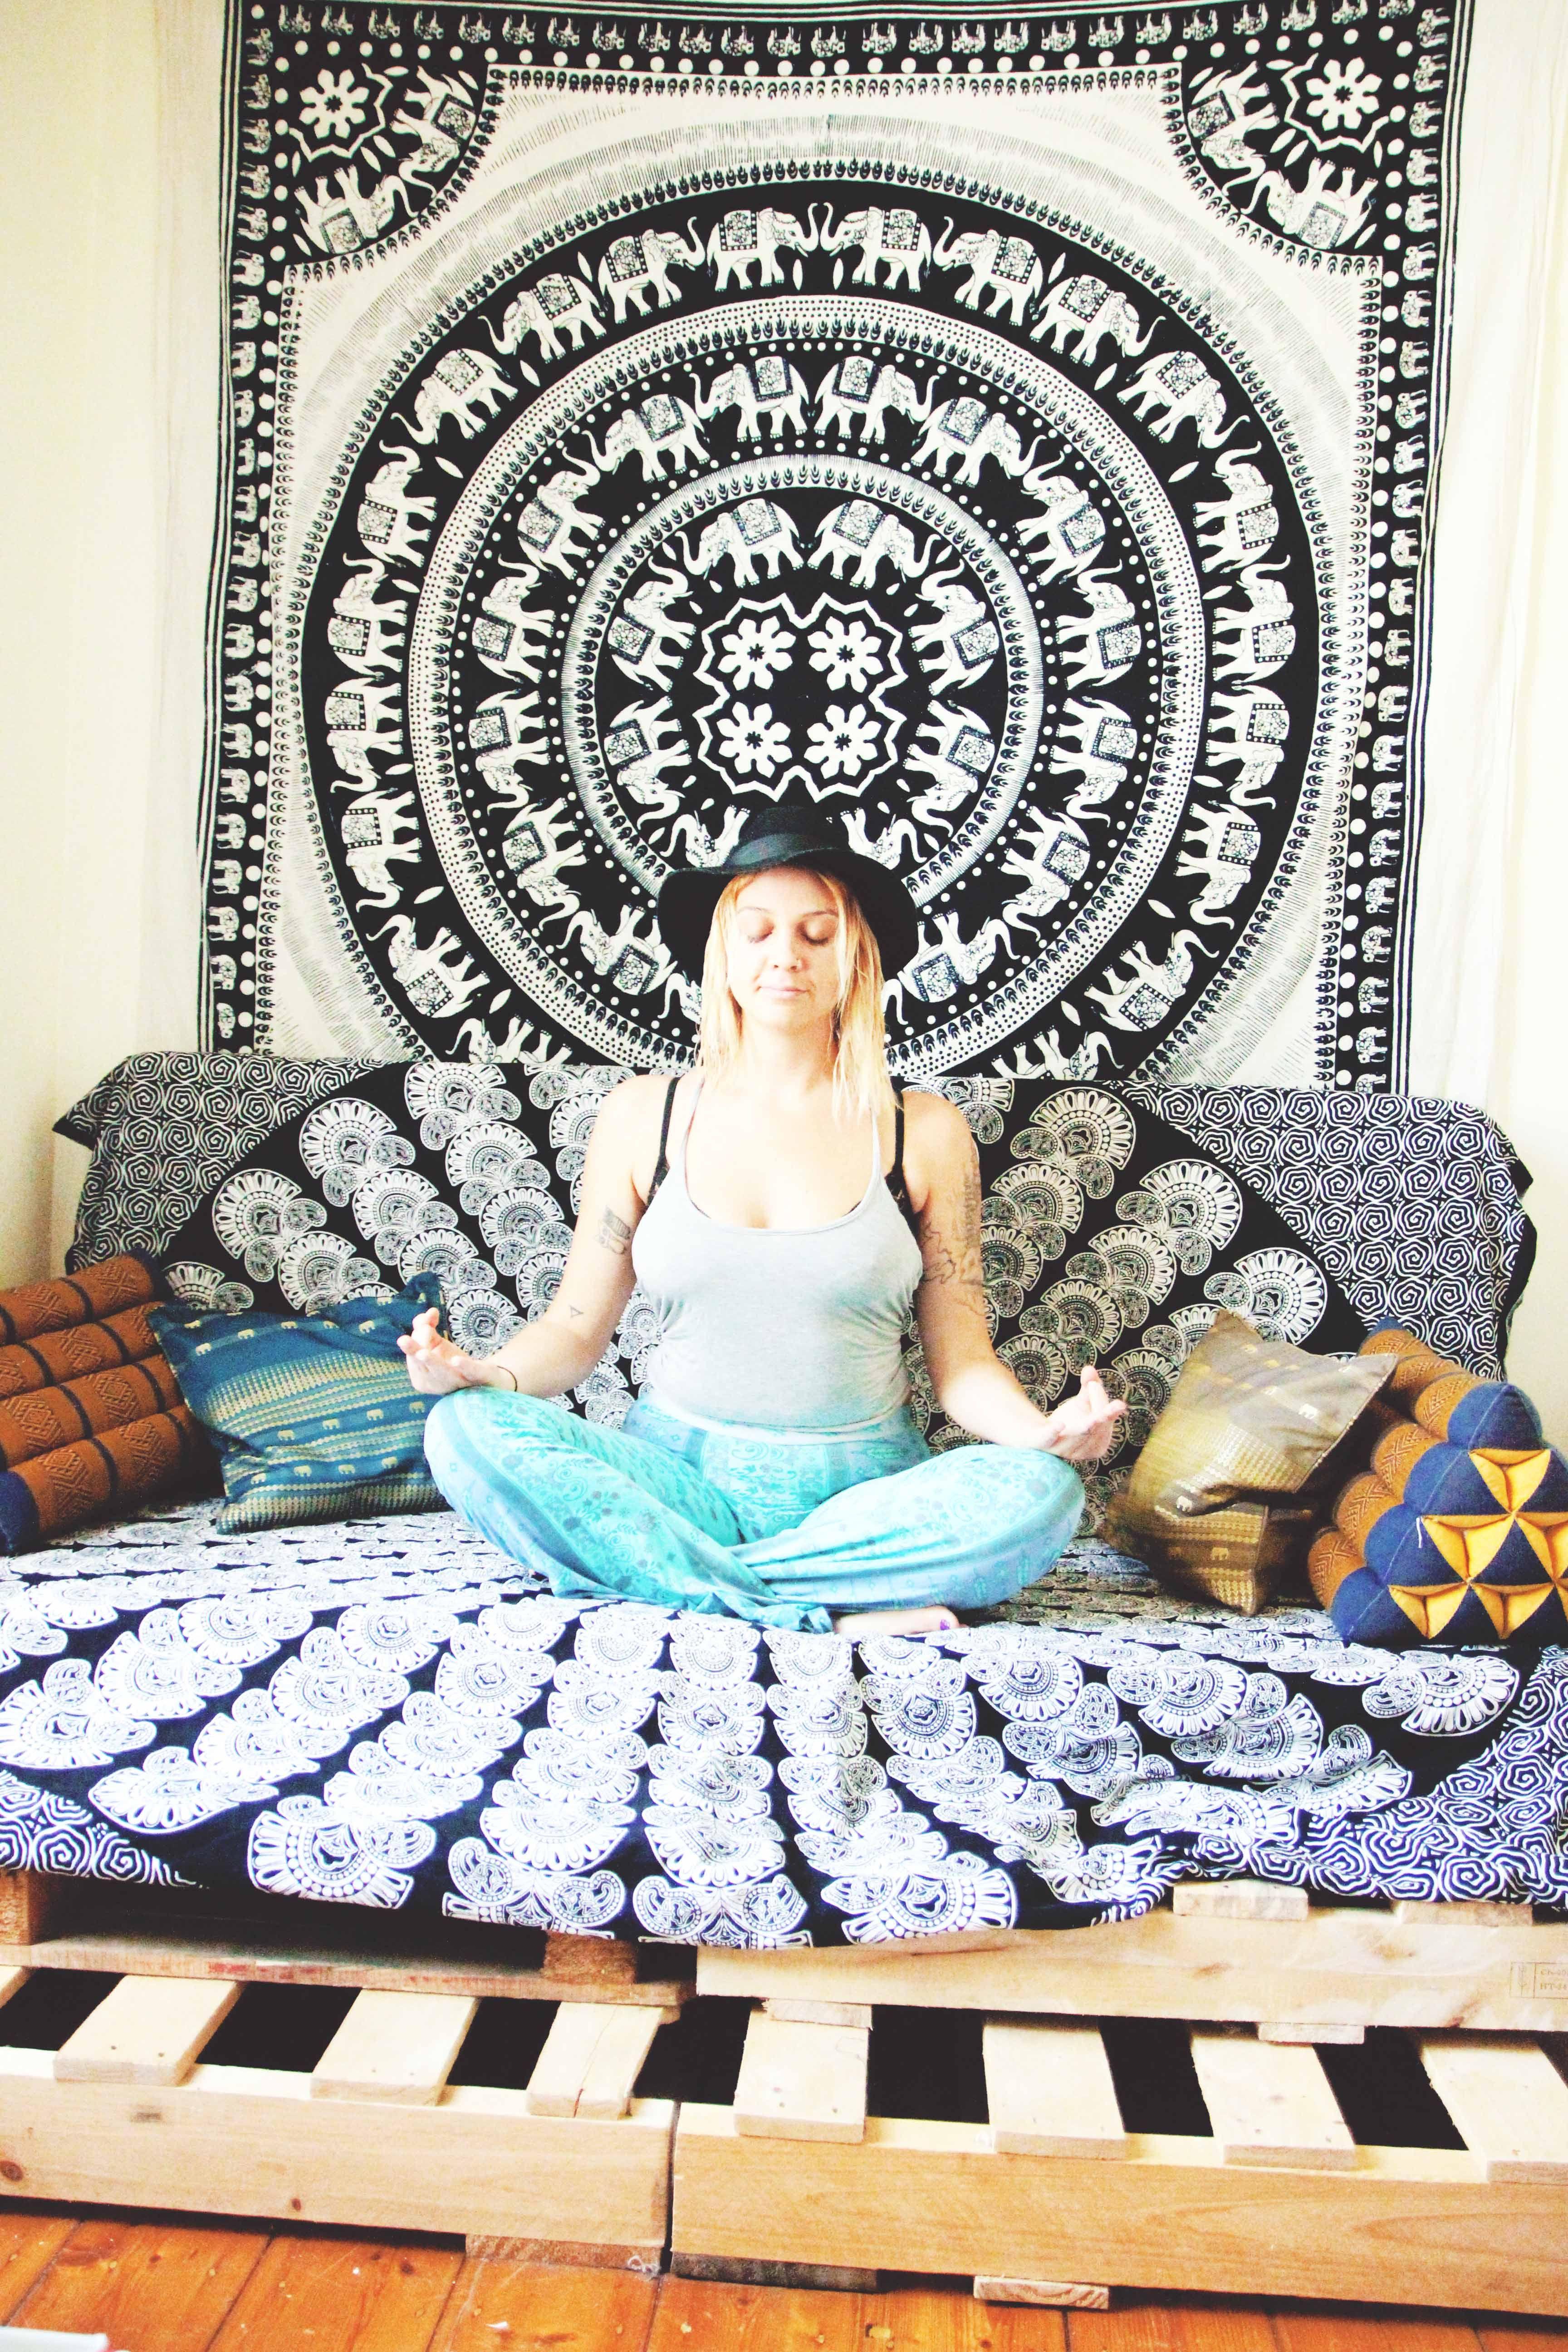 Day Bed fice Space Daze We Are All e Elephant Mandala Throw